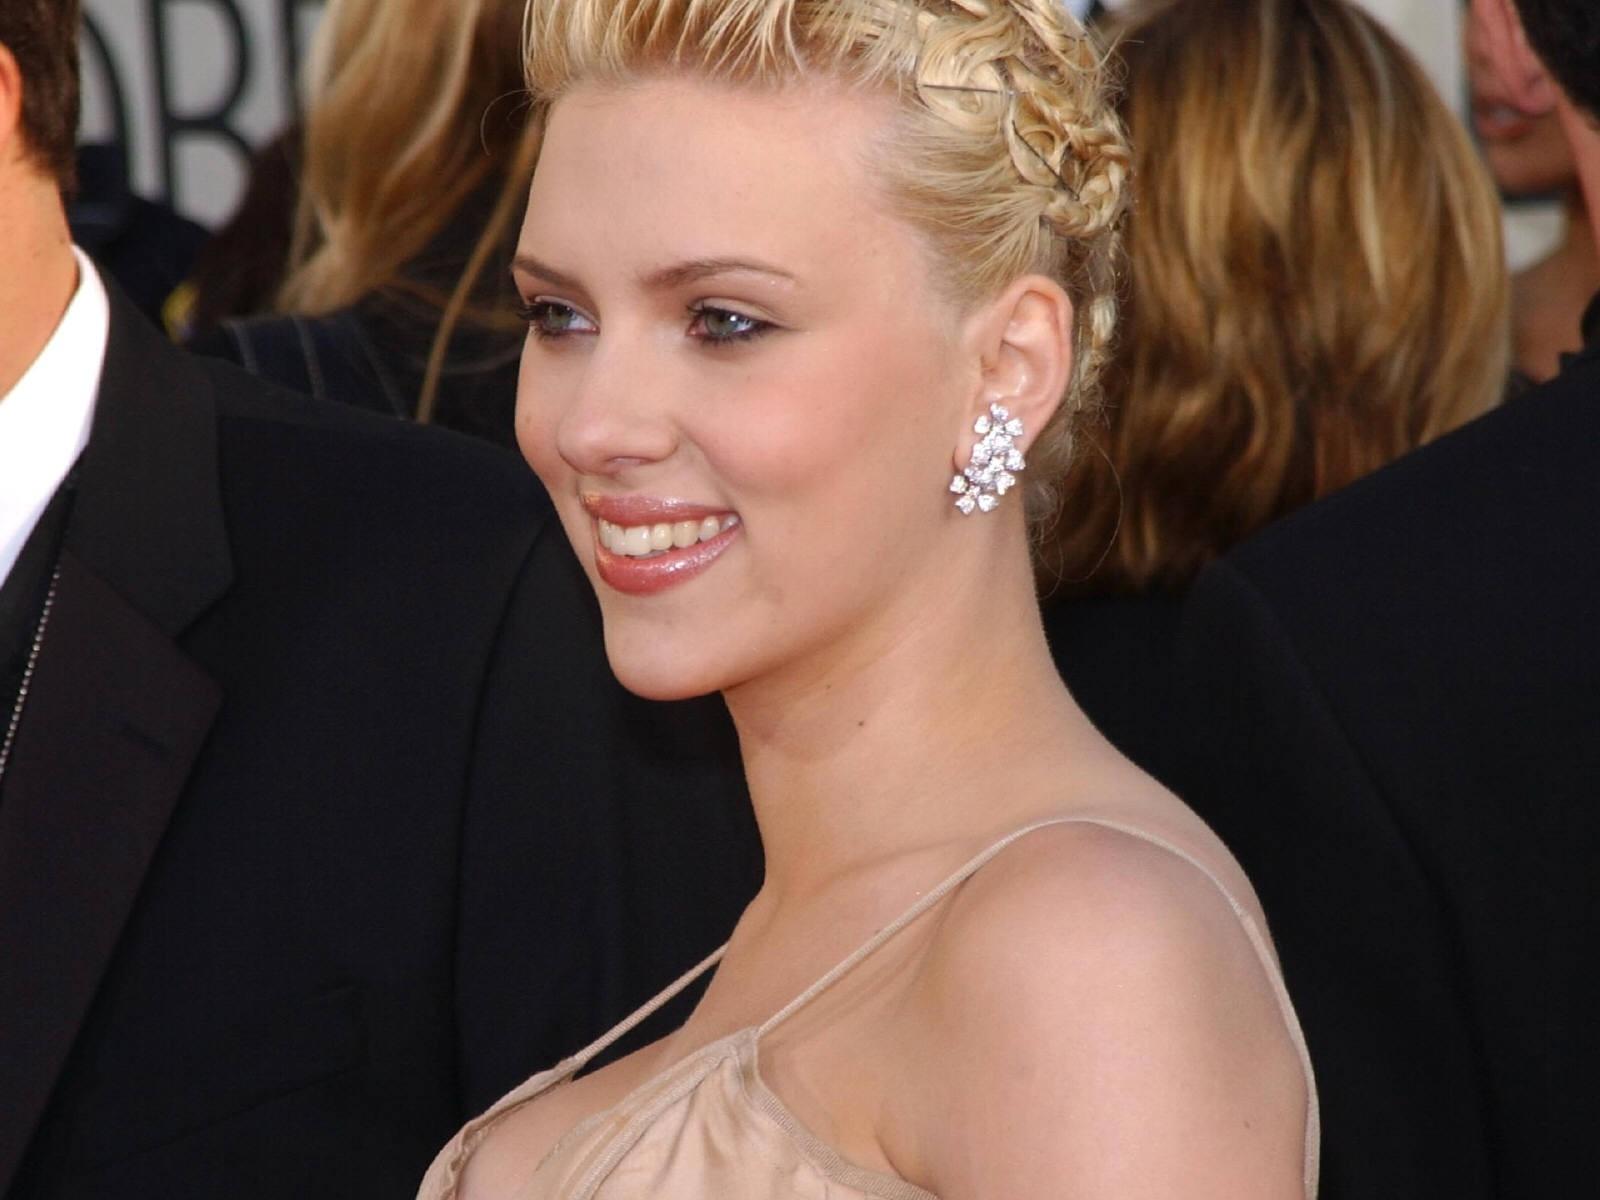 Wallpaper di Scarlett Johansson